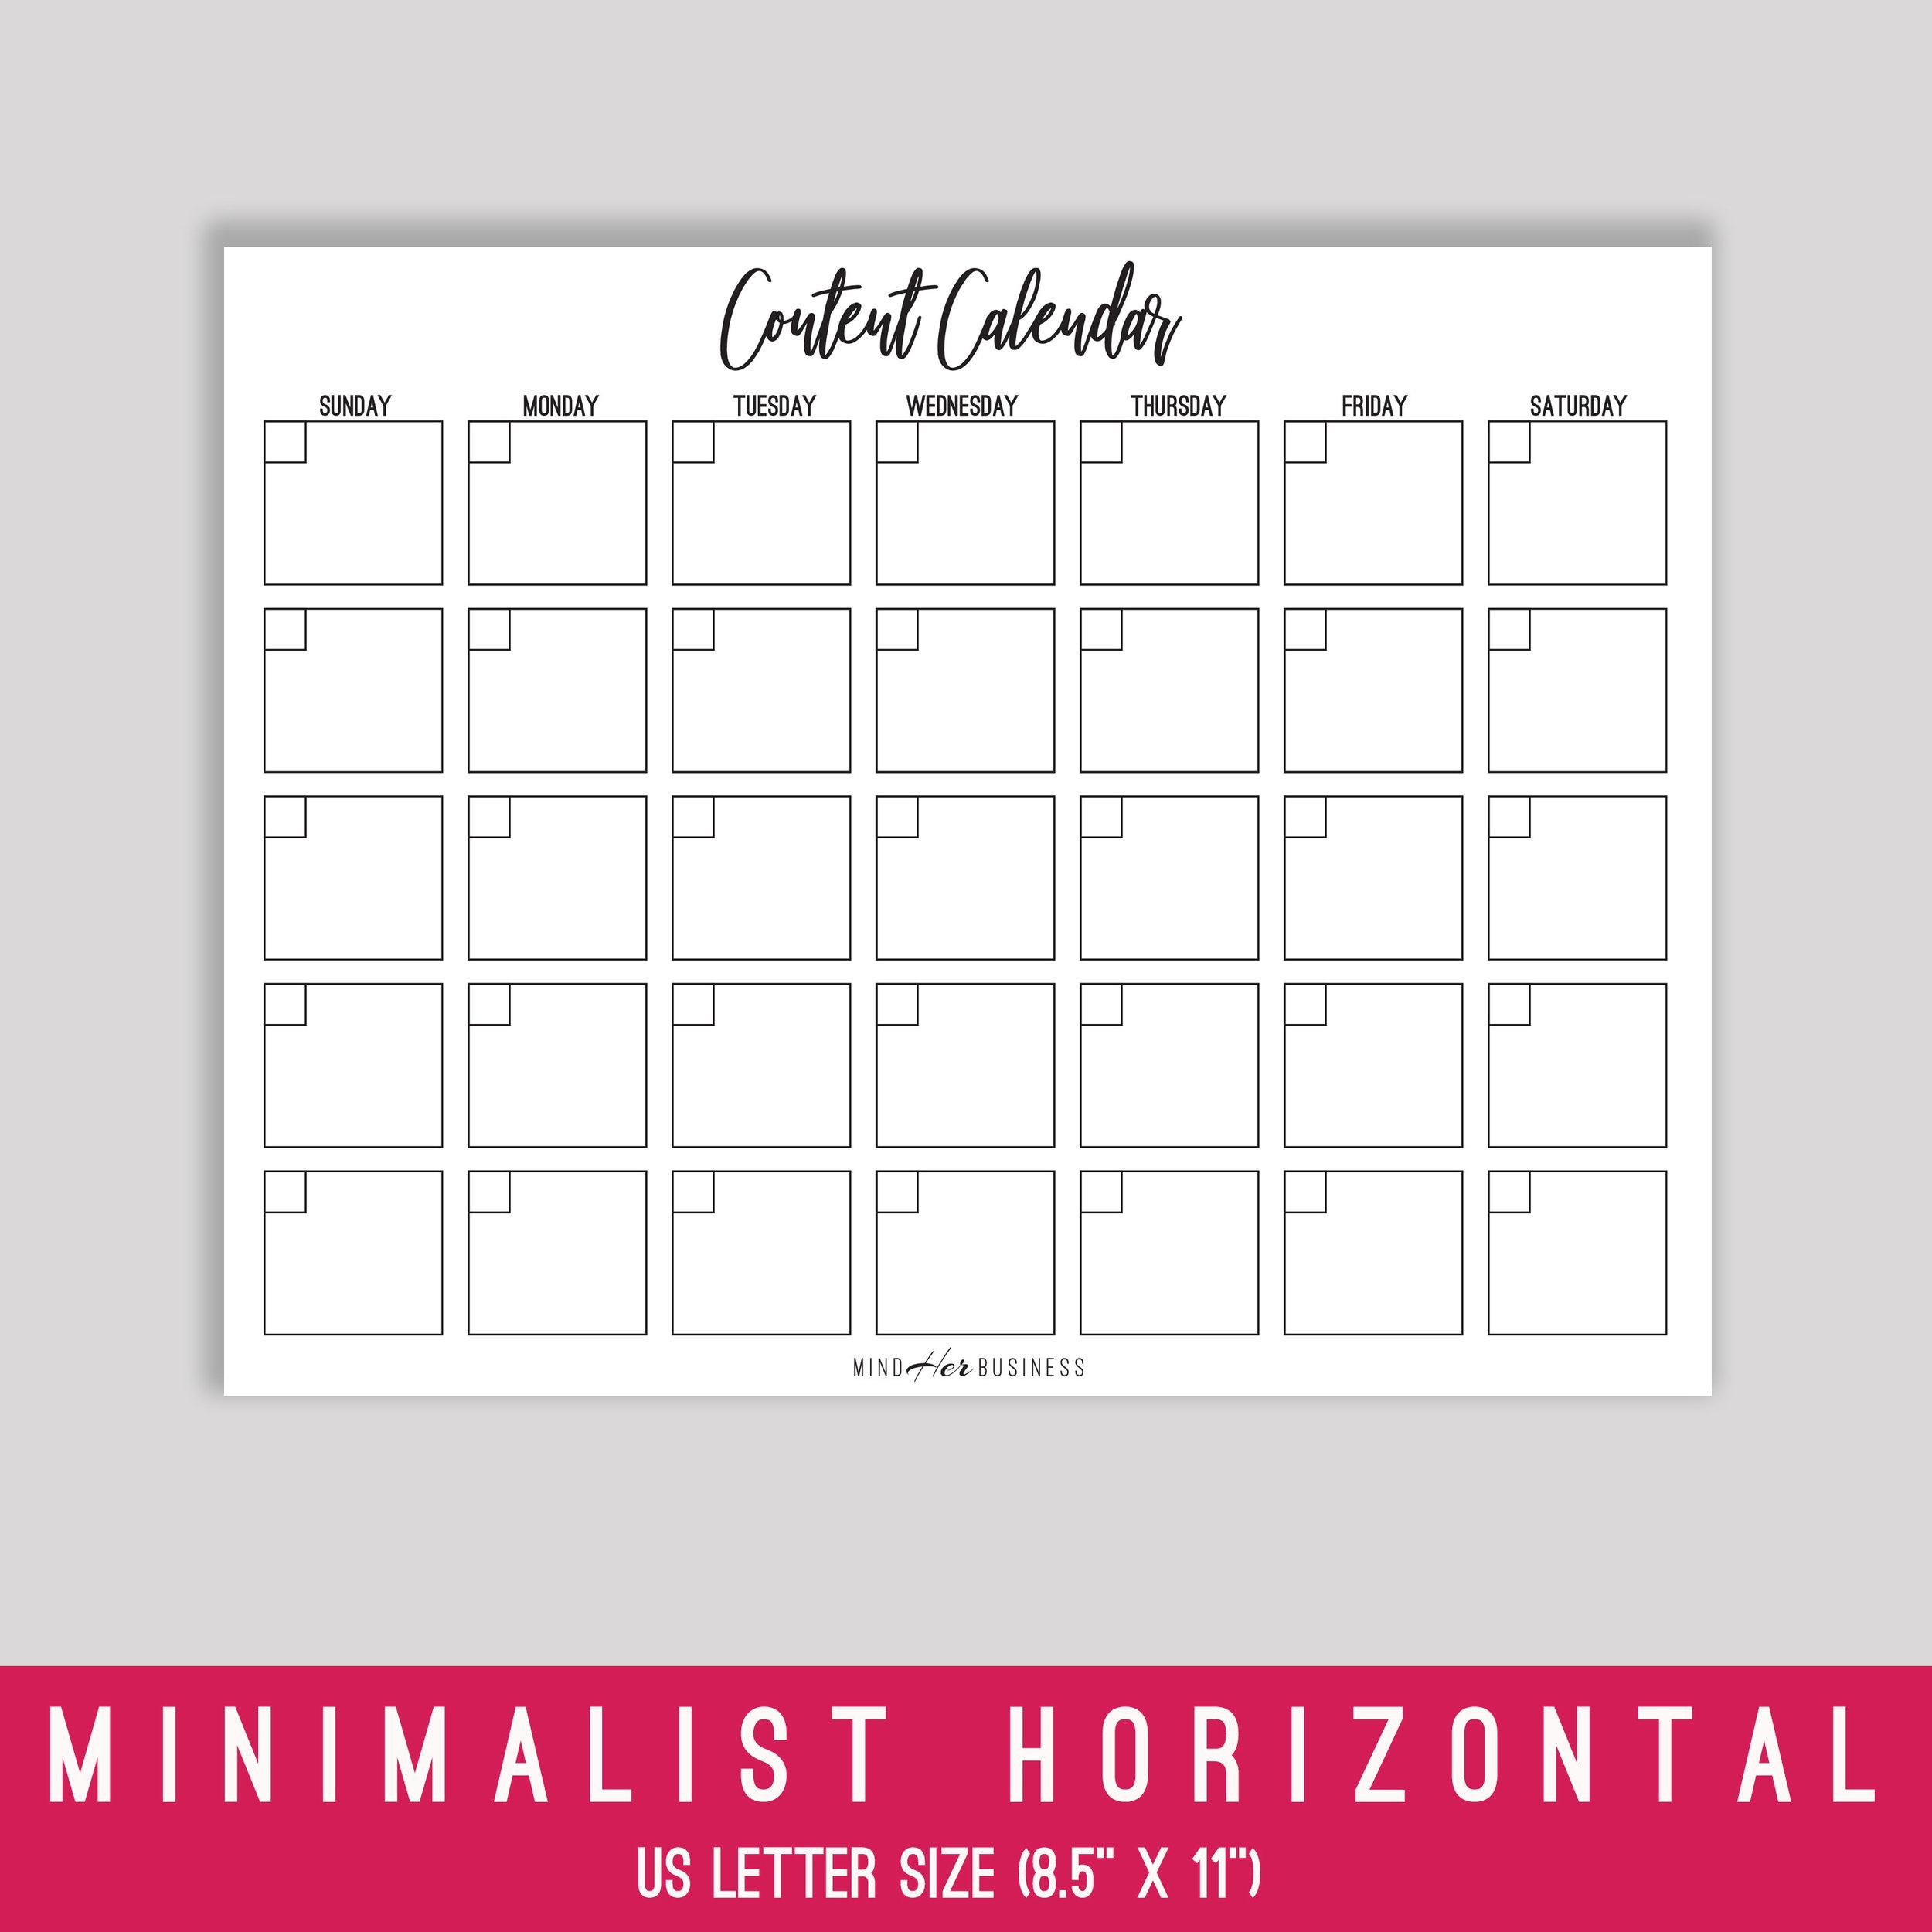 mhb-calendar-mockup-minimalist-horizontal-letter.jpg